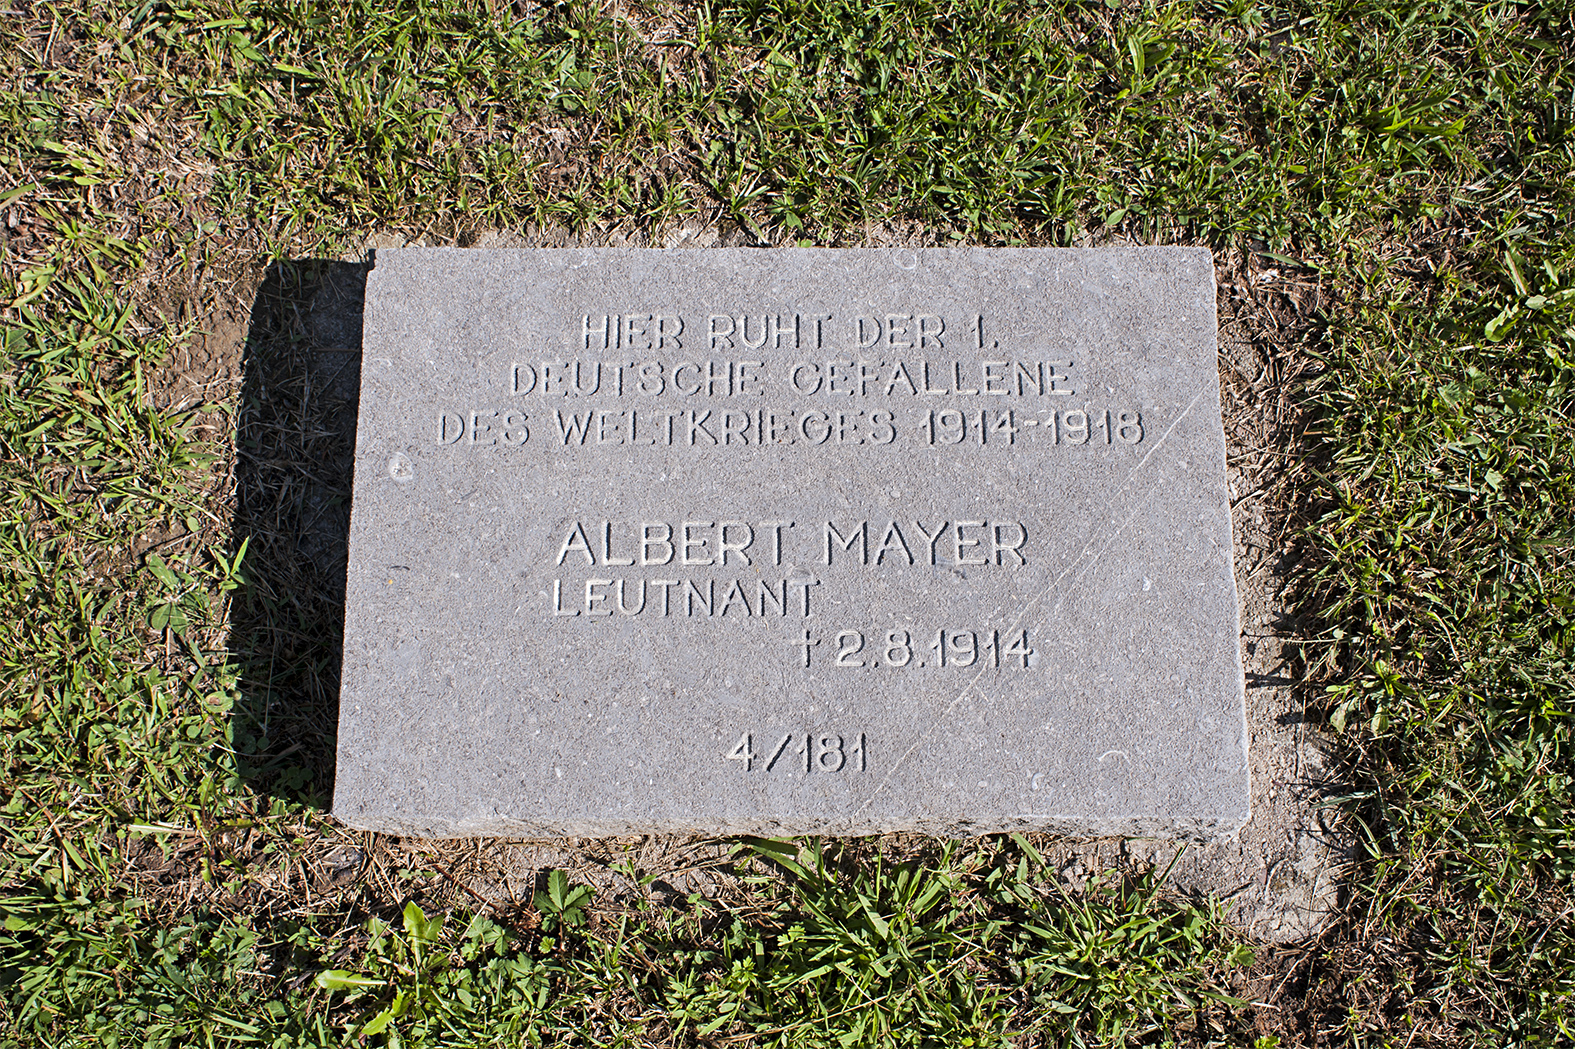 http://upload.wikimedia.org/wikipedia/commons/1/1b/Leutnant_Albert_Mayer_Grabstein_01_09.jpg